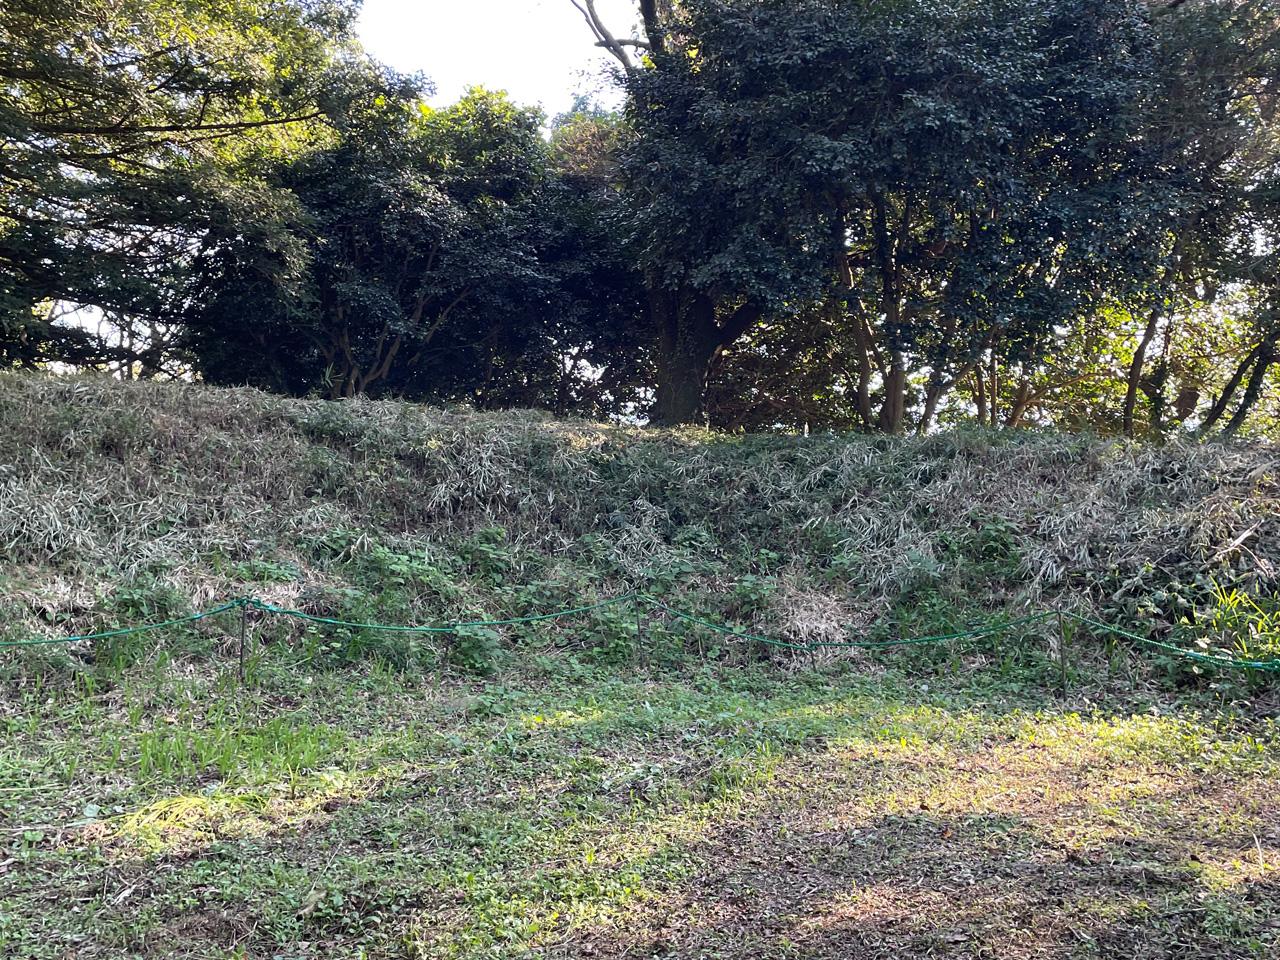 津久井城山頂の本城曲輪